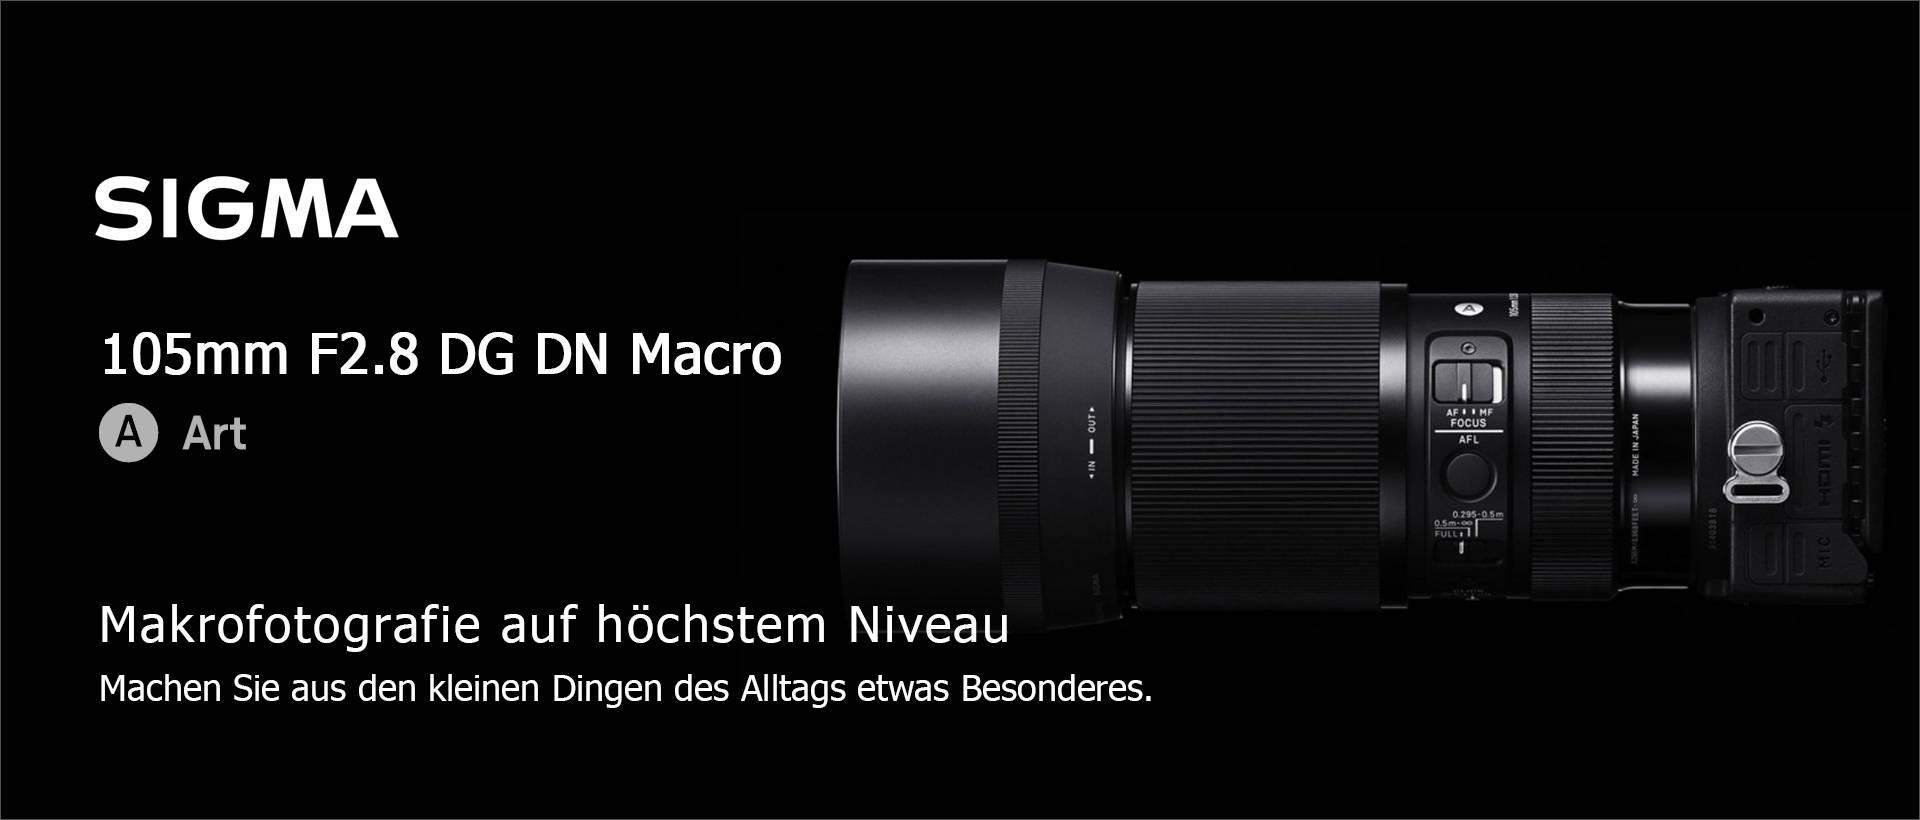 SIGMA 105mm F2.8 DG DN MACRO | Art – L-Mount